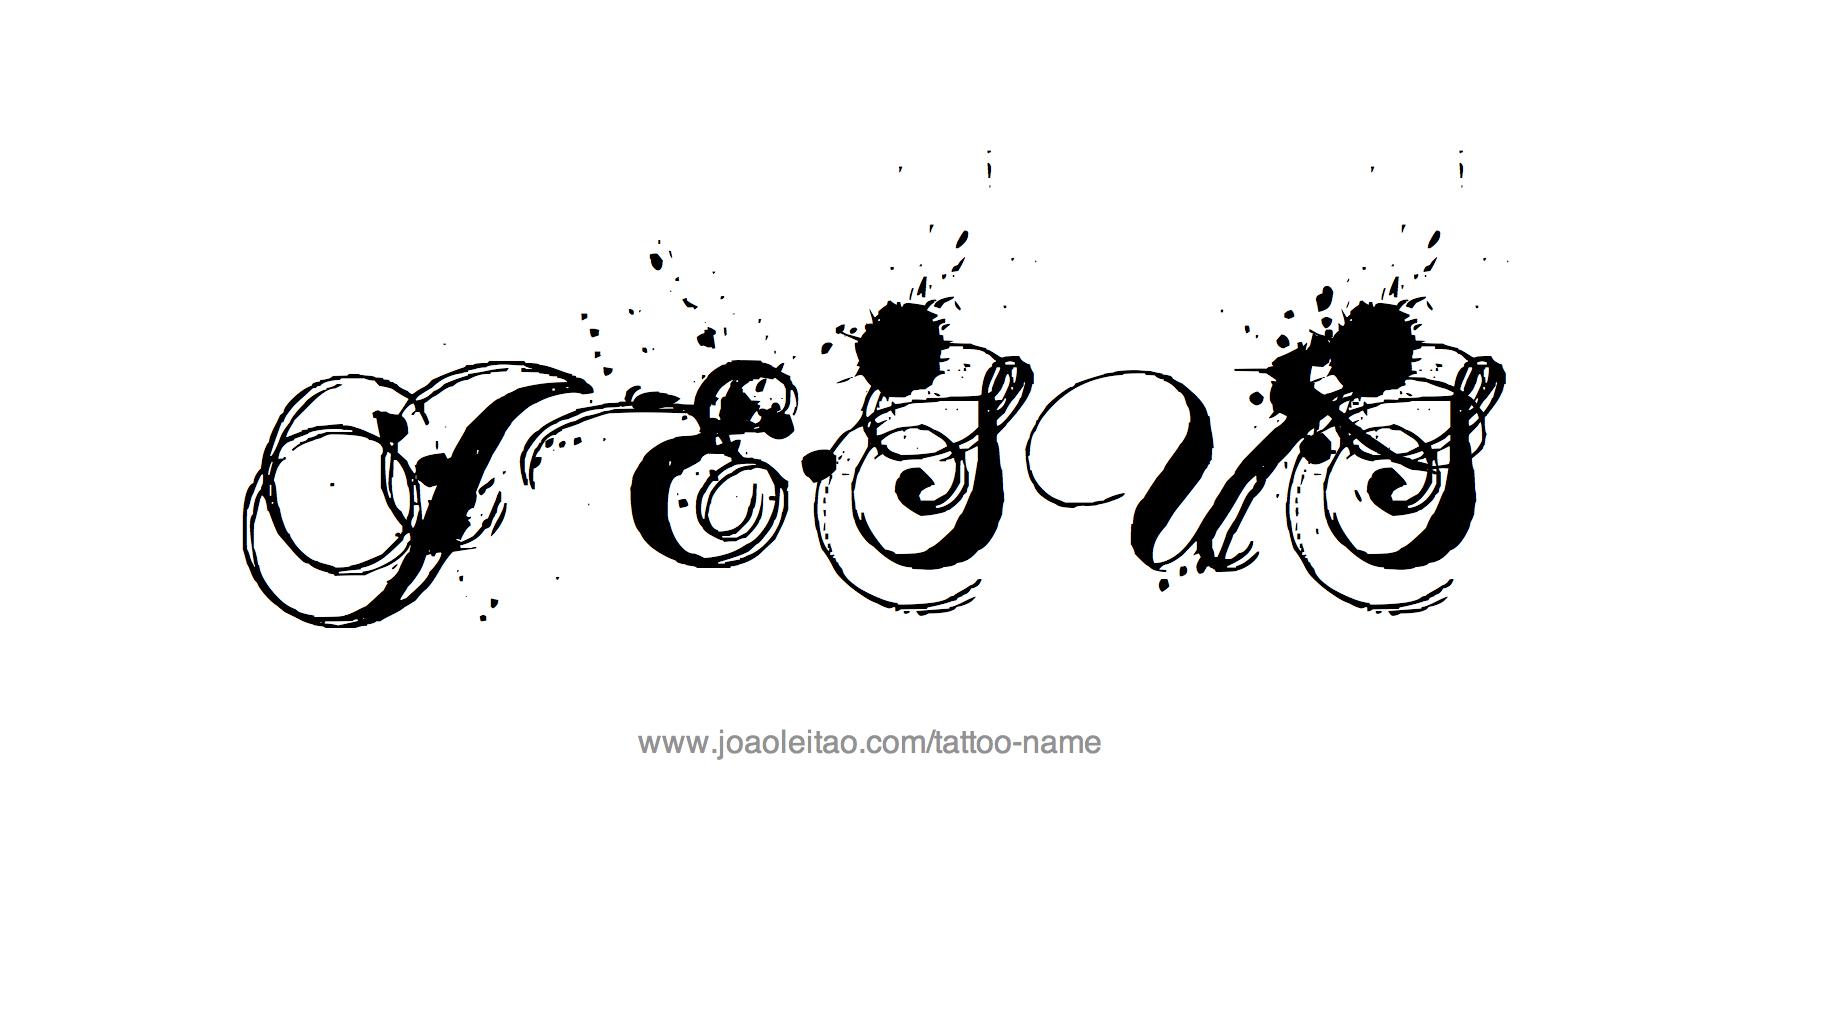 jesus name tattoo designs